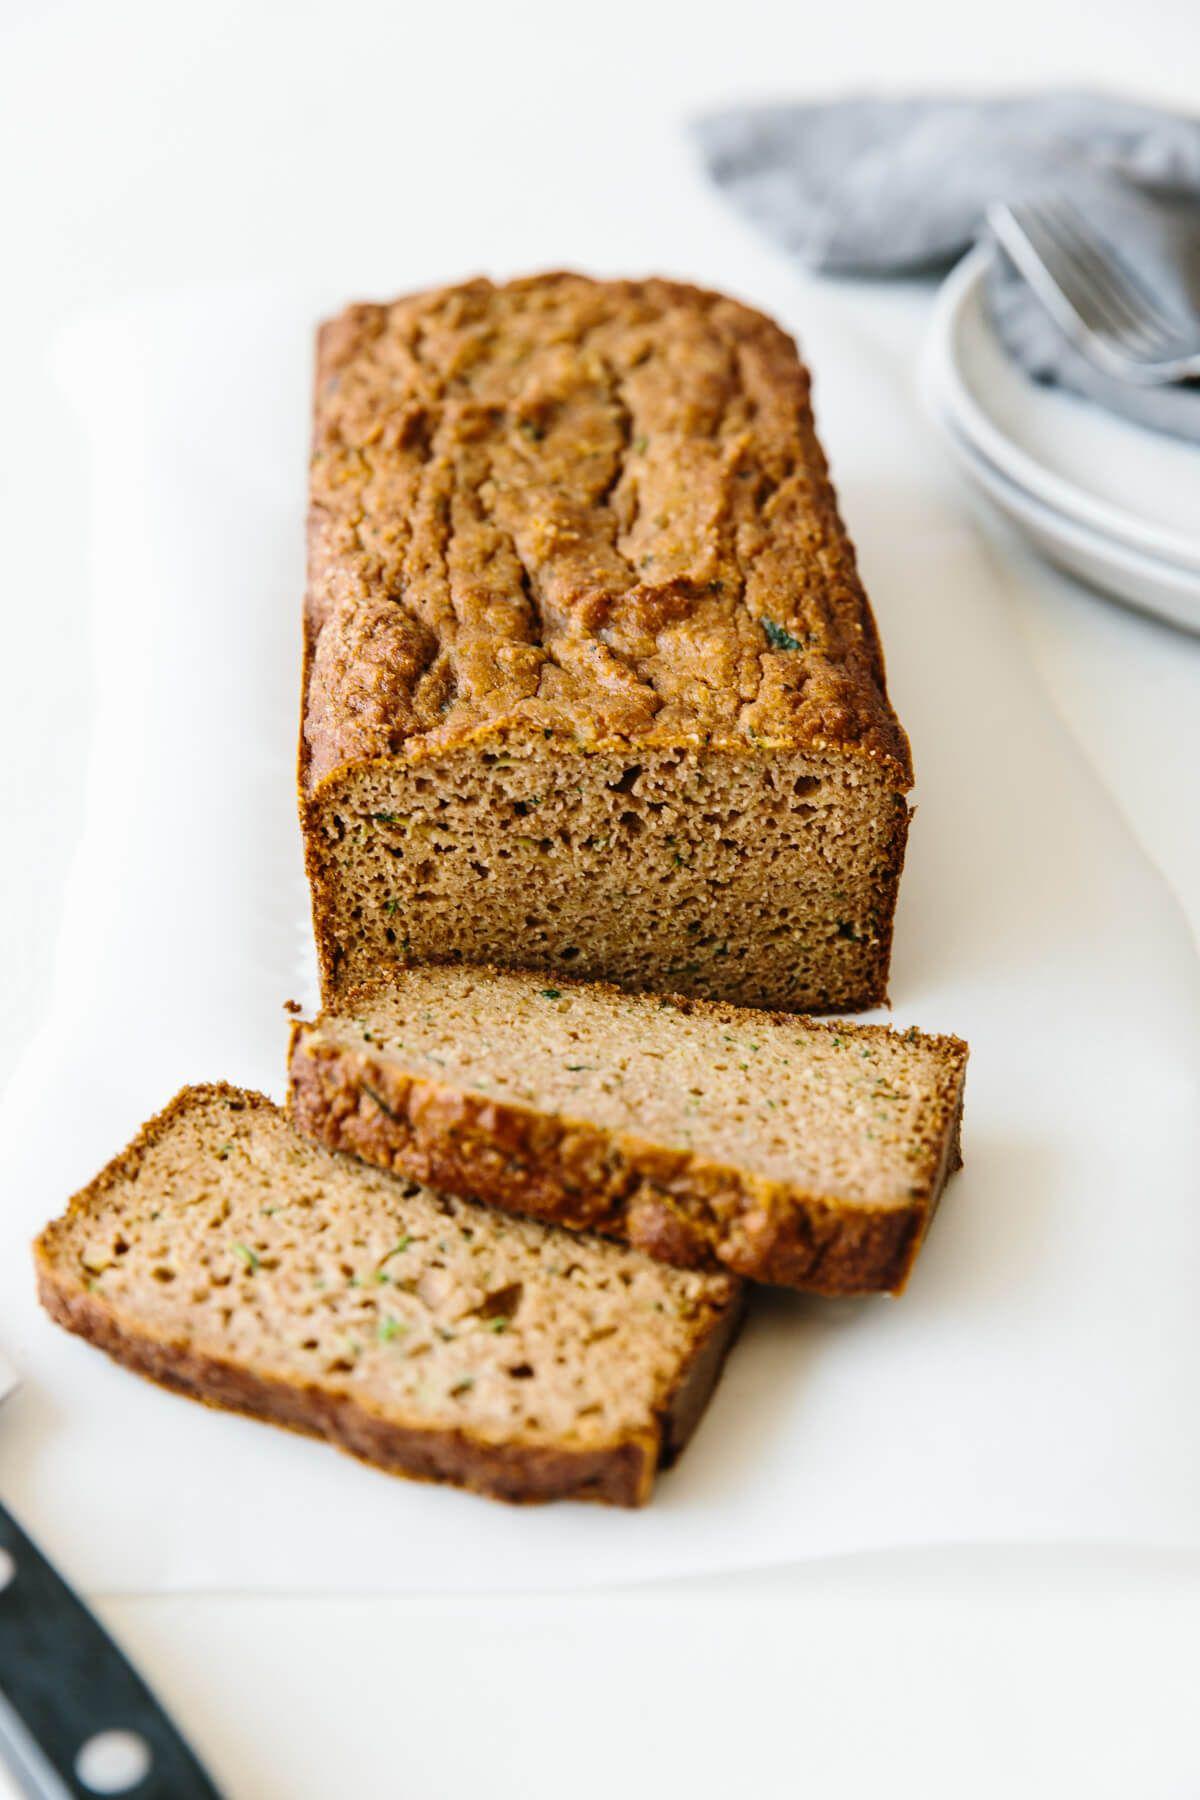 Paleo Zucchini Bread Gluten Free Dairy Free Downshiftology In 2020 Paleo Zucchini Bread Paleo Baking Paleo Zucchini